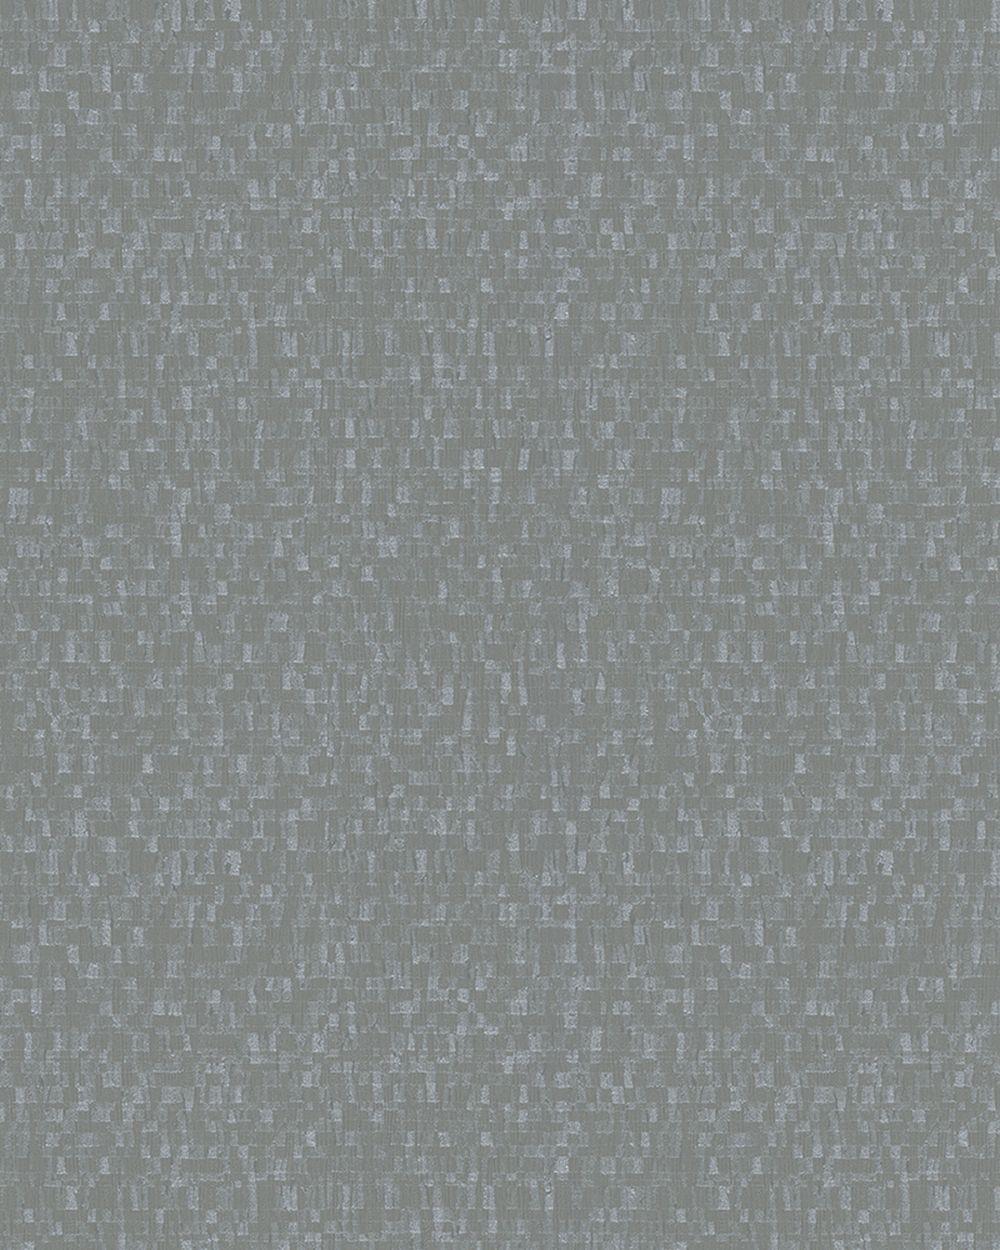 Vliestapete design muster grau silber glanz marburg 59348 for Vliestapete muster